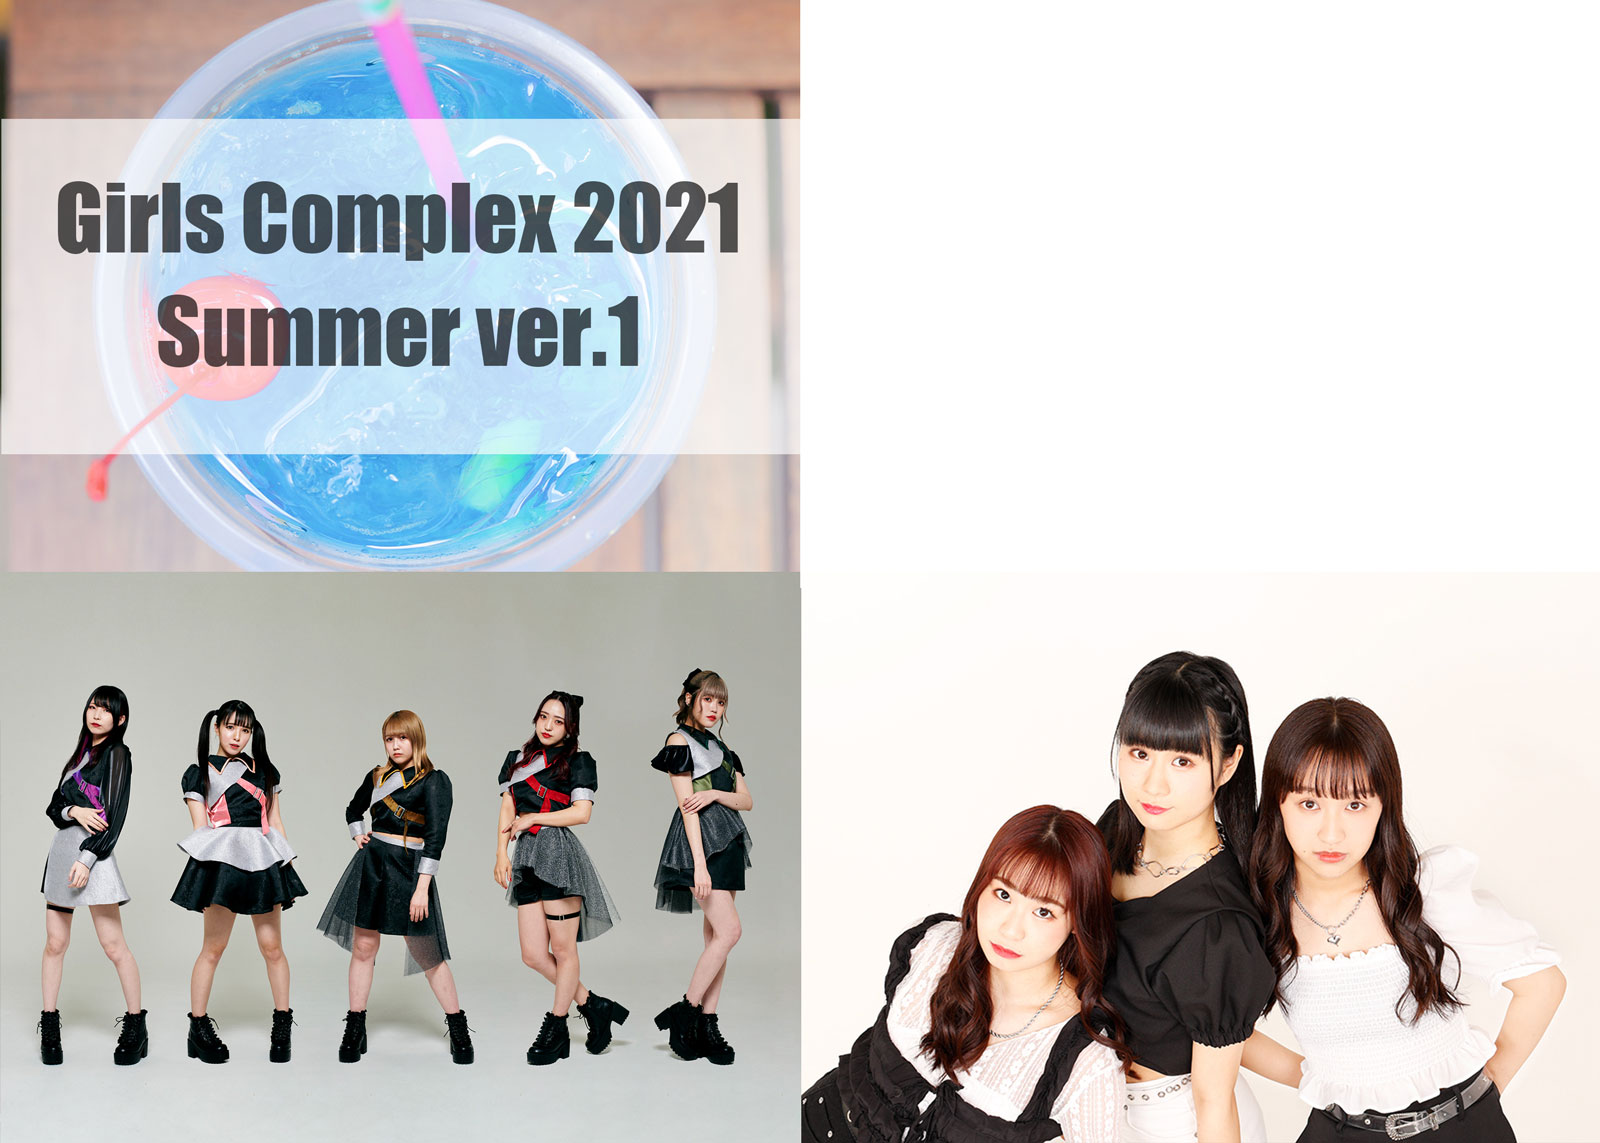 Girls Complex 2021 Summer ver.1